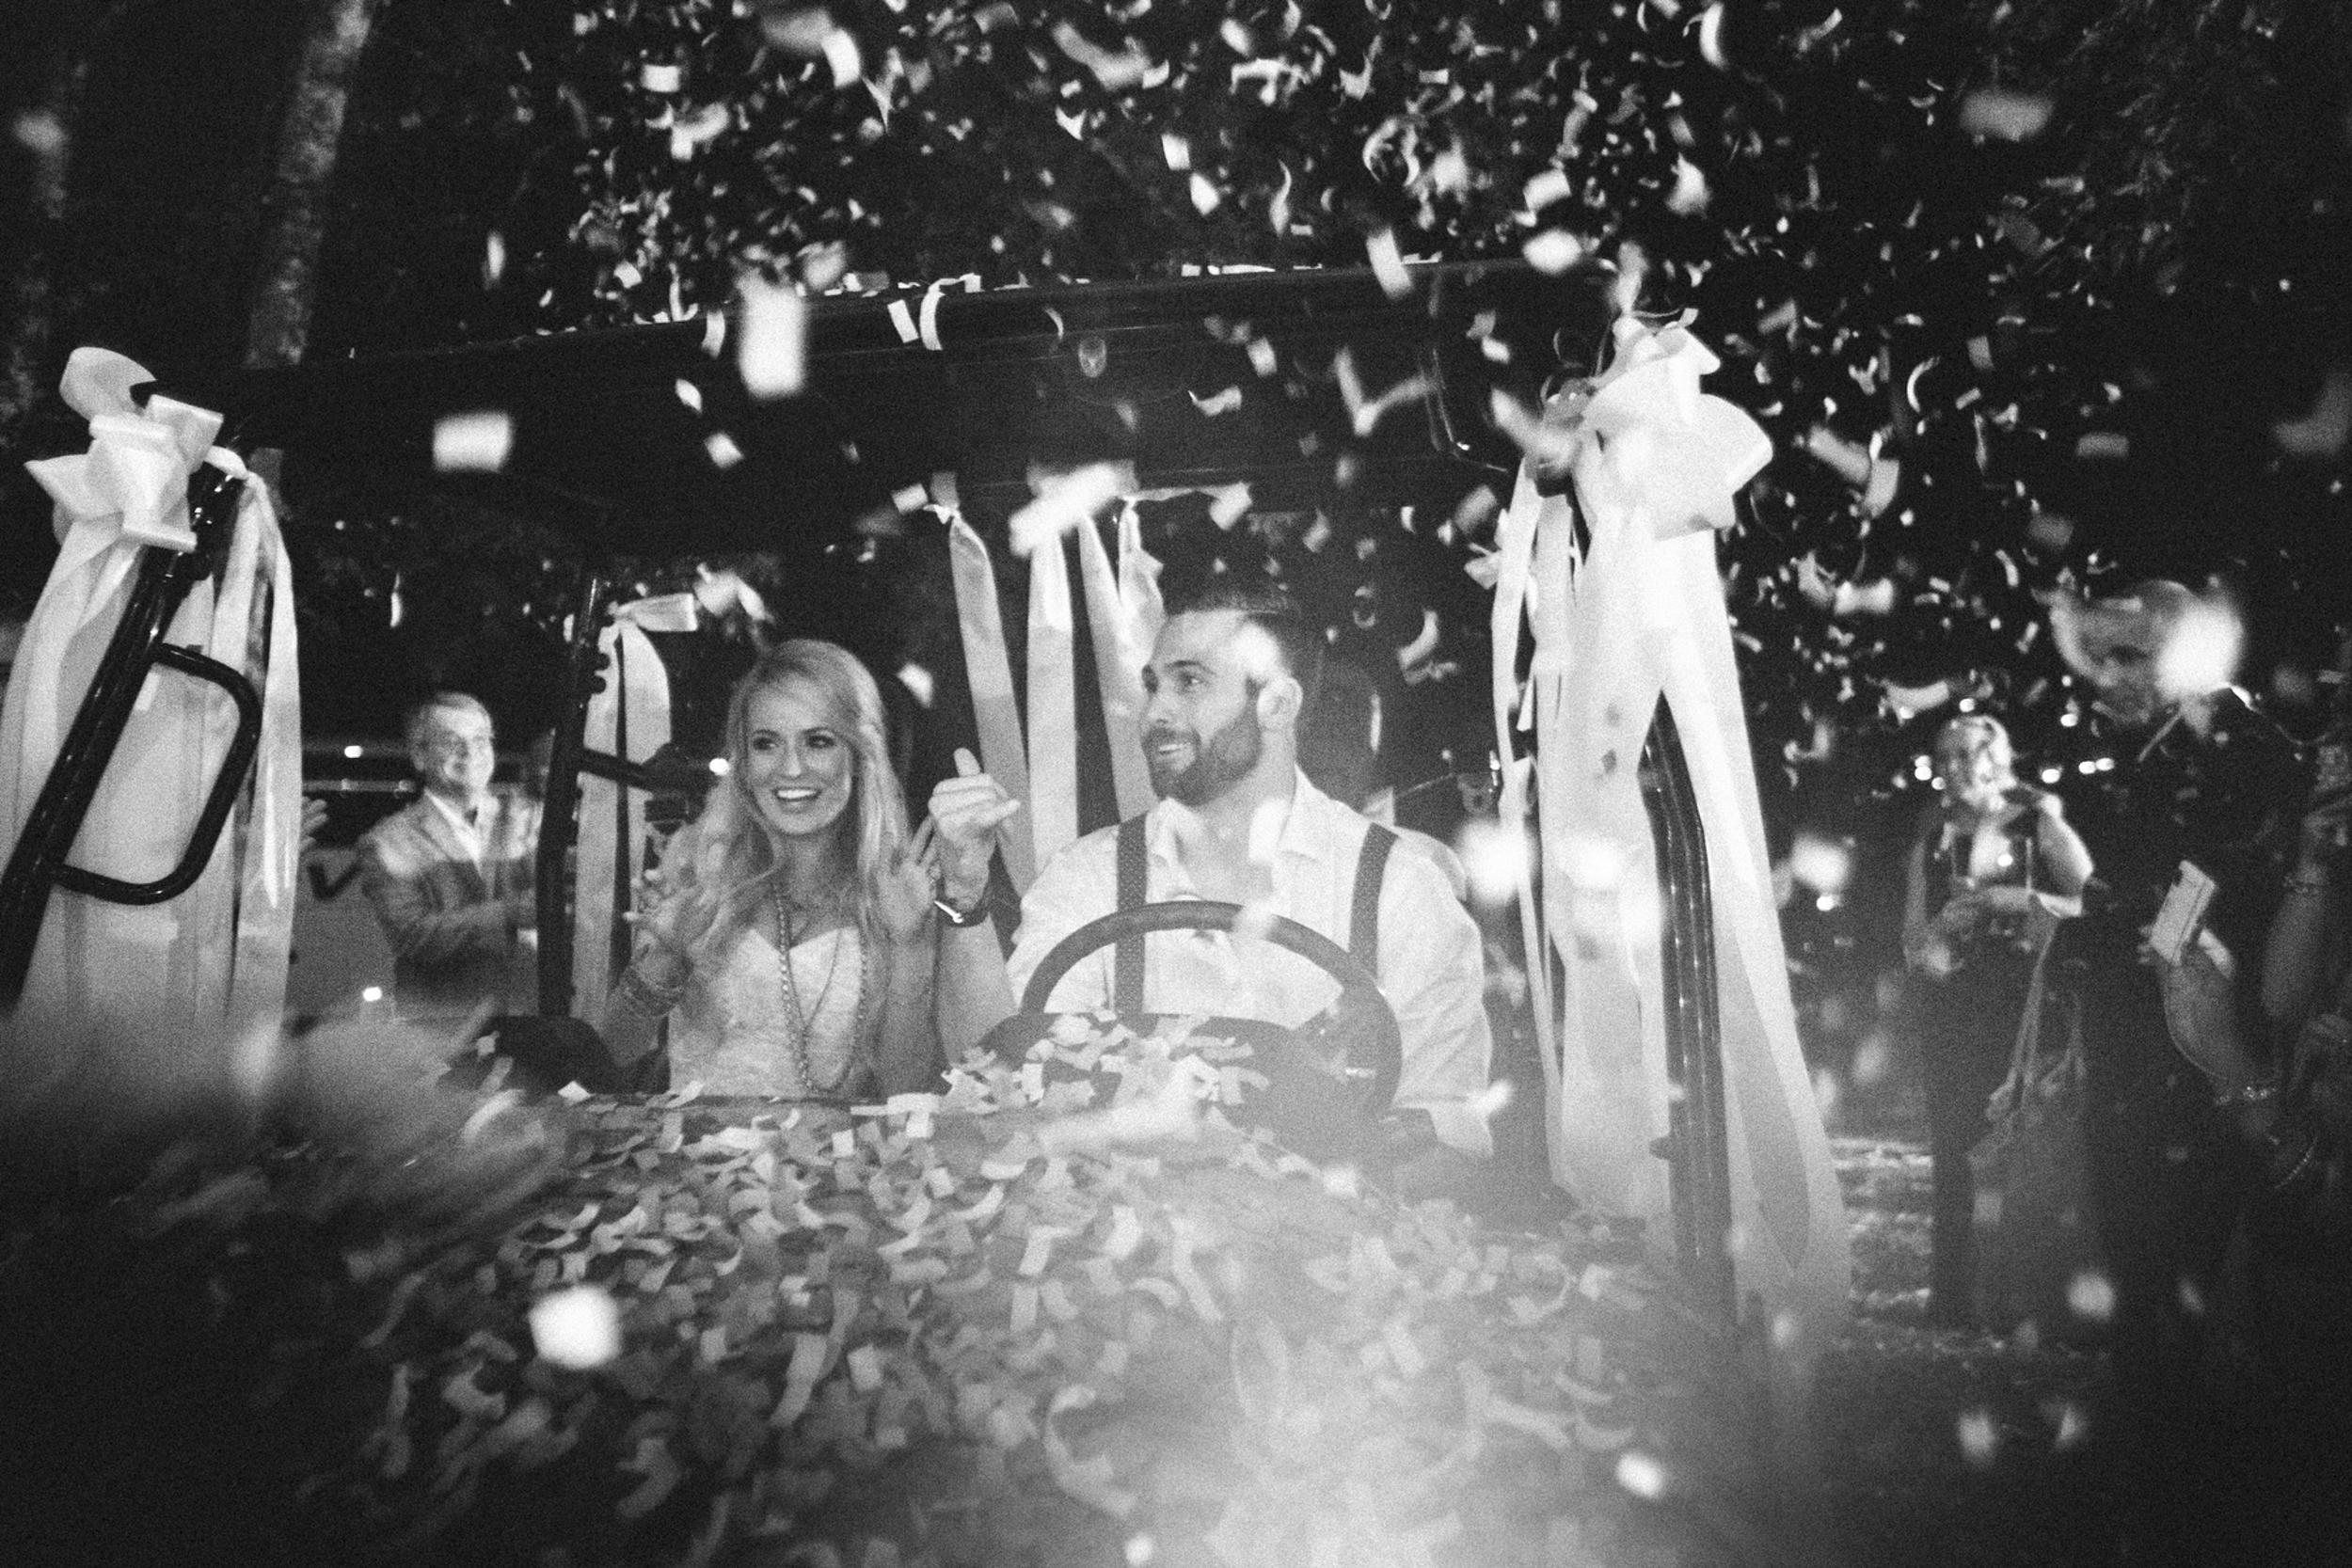 south_carolina_farm_wedding_rustic_chic_surprise_secret_luxe_wedding_bachelorette_emily_maynard_real_weddings-10.jpg